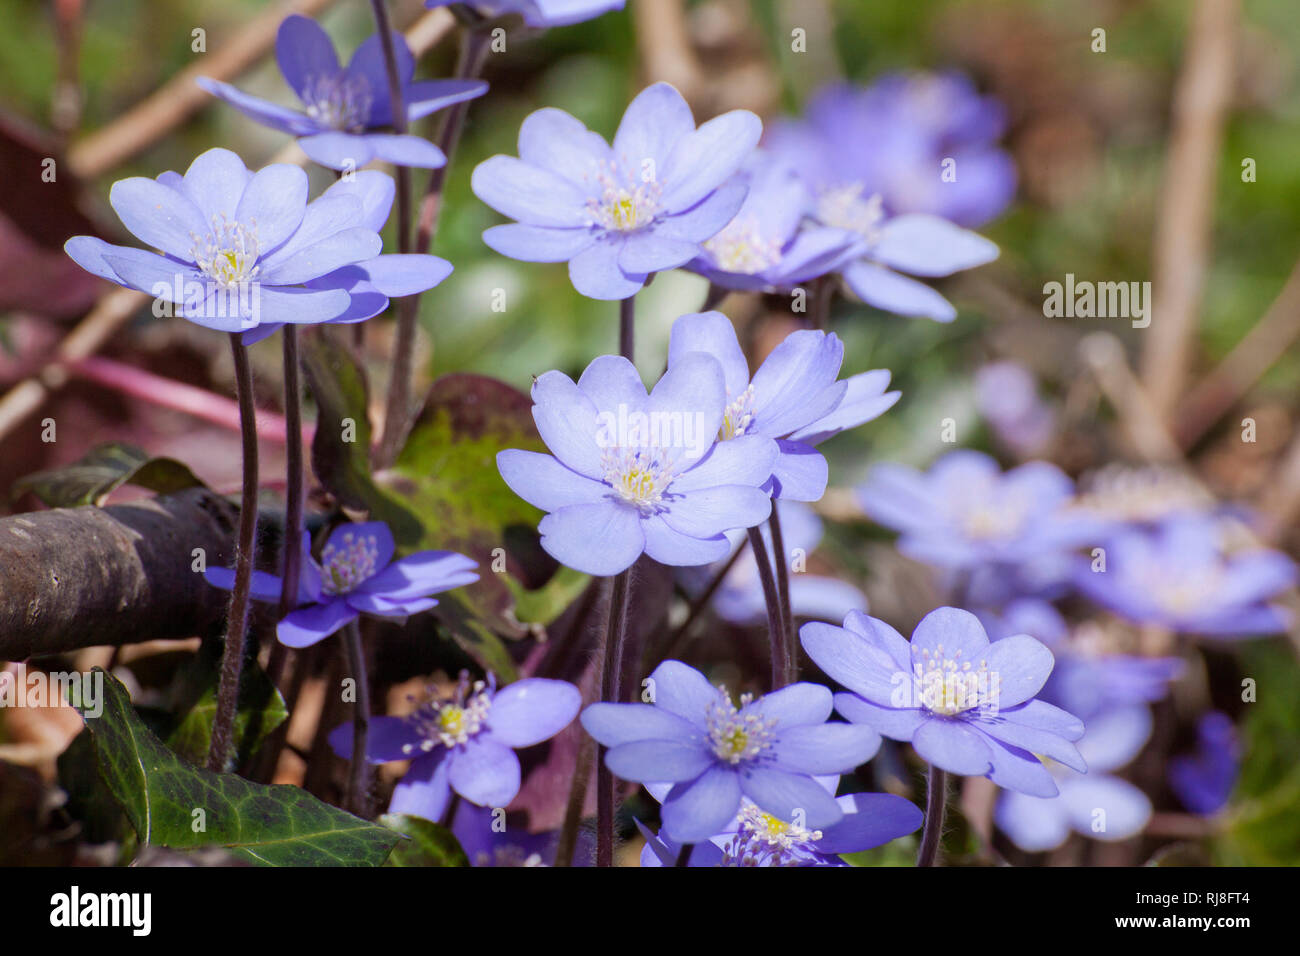 Blühende Leberblümchen im Frühling, Hapatica nobilis - Stock Image